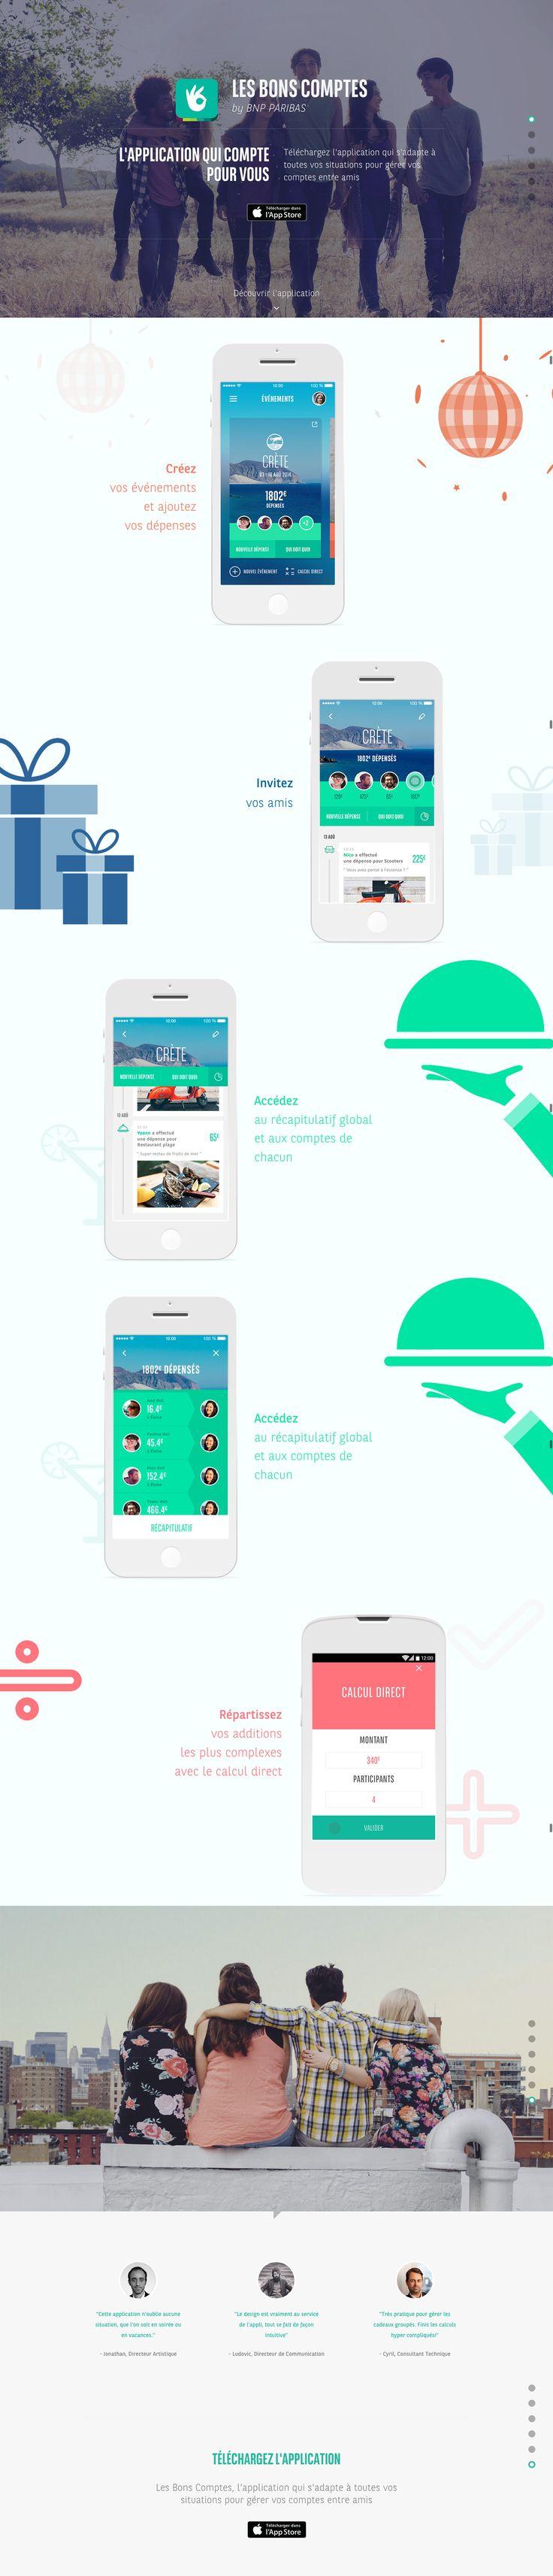 Les Bons Comptes | BNP Paribas - https://lesbonscomptes.bnpparibas.net/ - #webdesign #onepage #scroll #scrollmagic #interactive #app